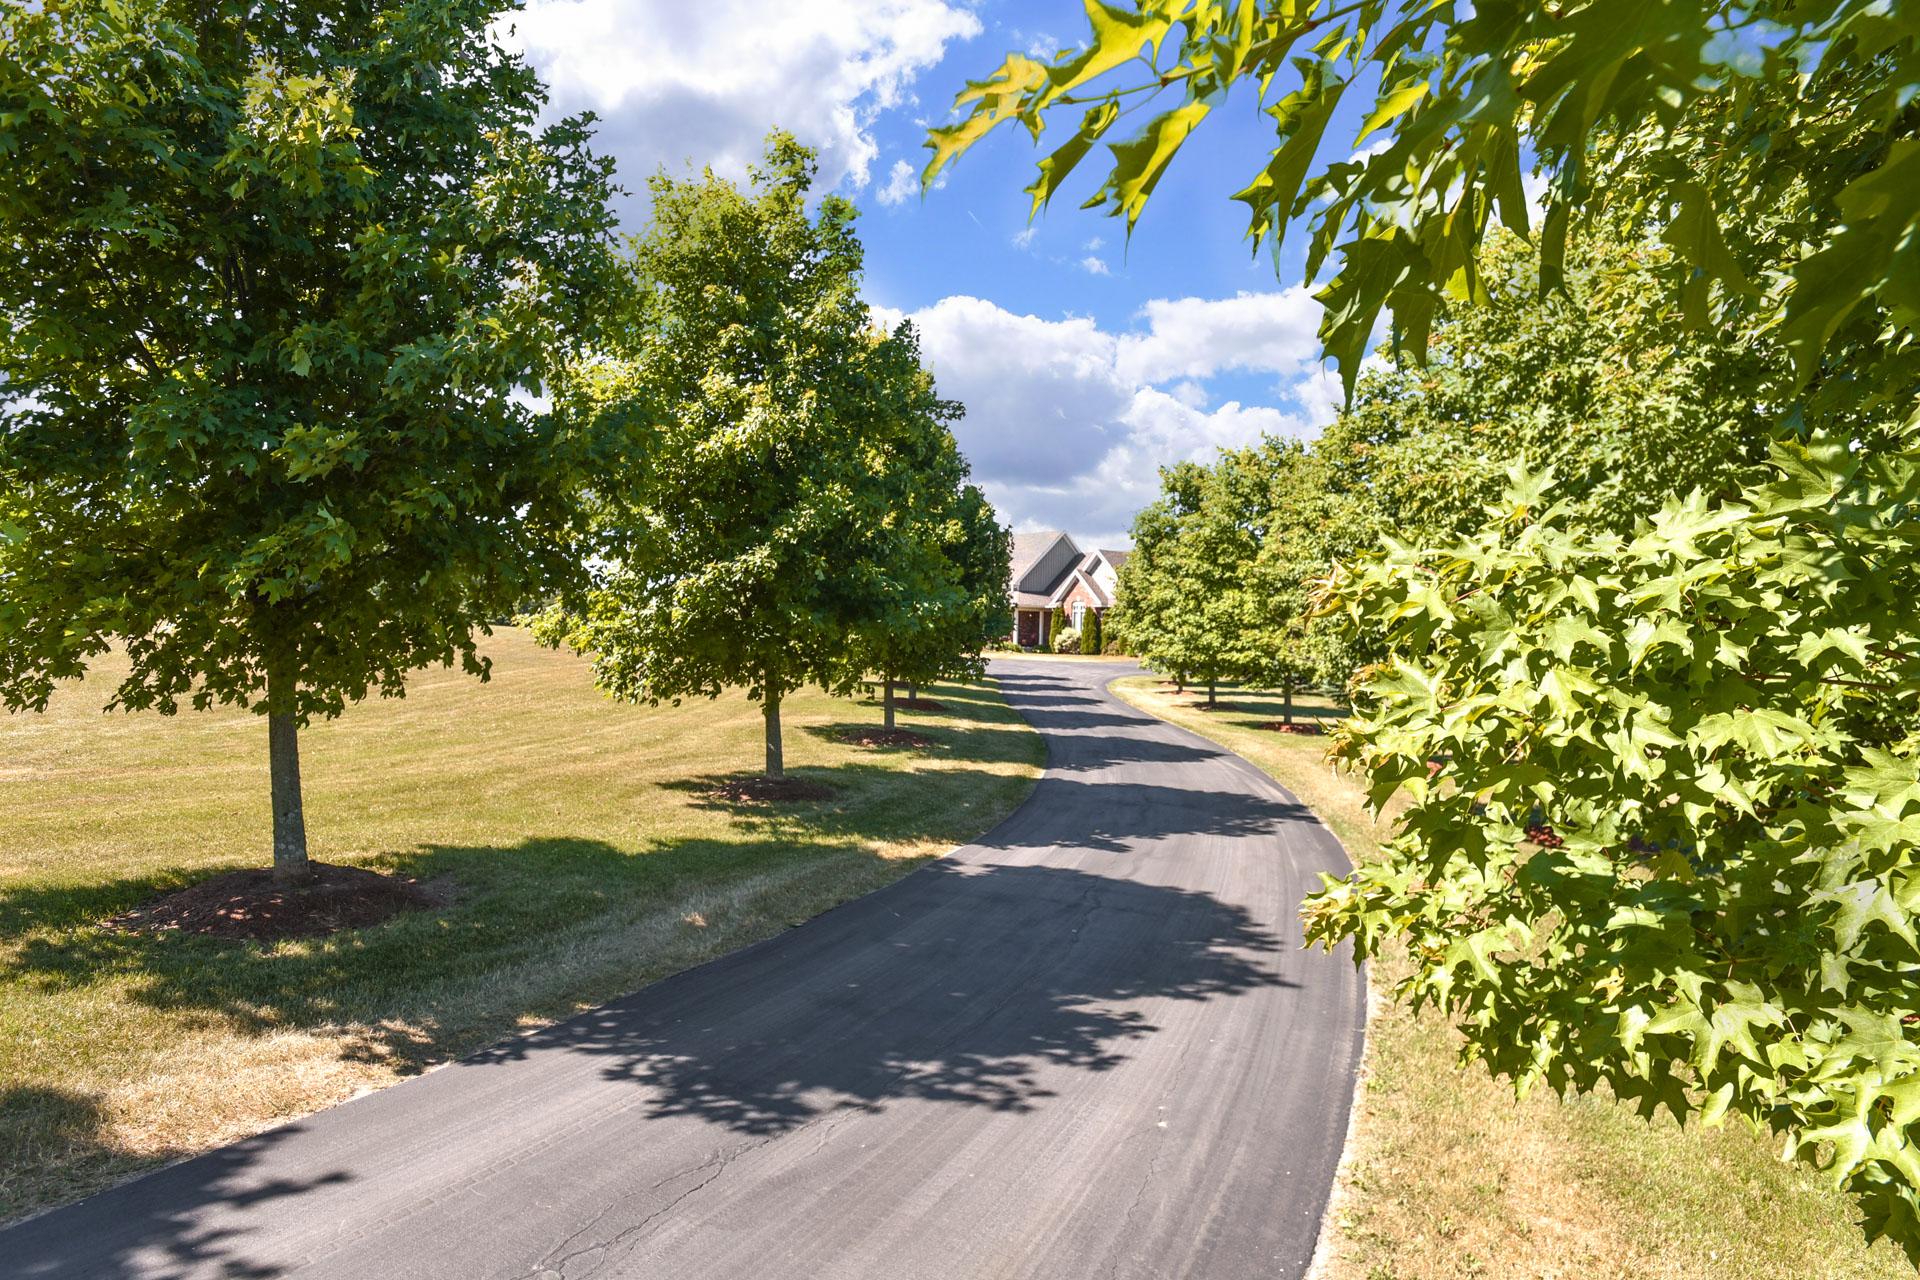 744 Highpoint Sideroad, Caledon, Ontario, Mary Klein